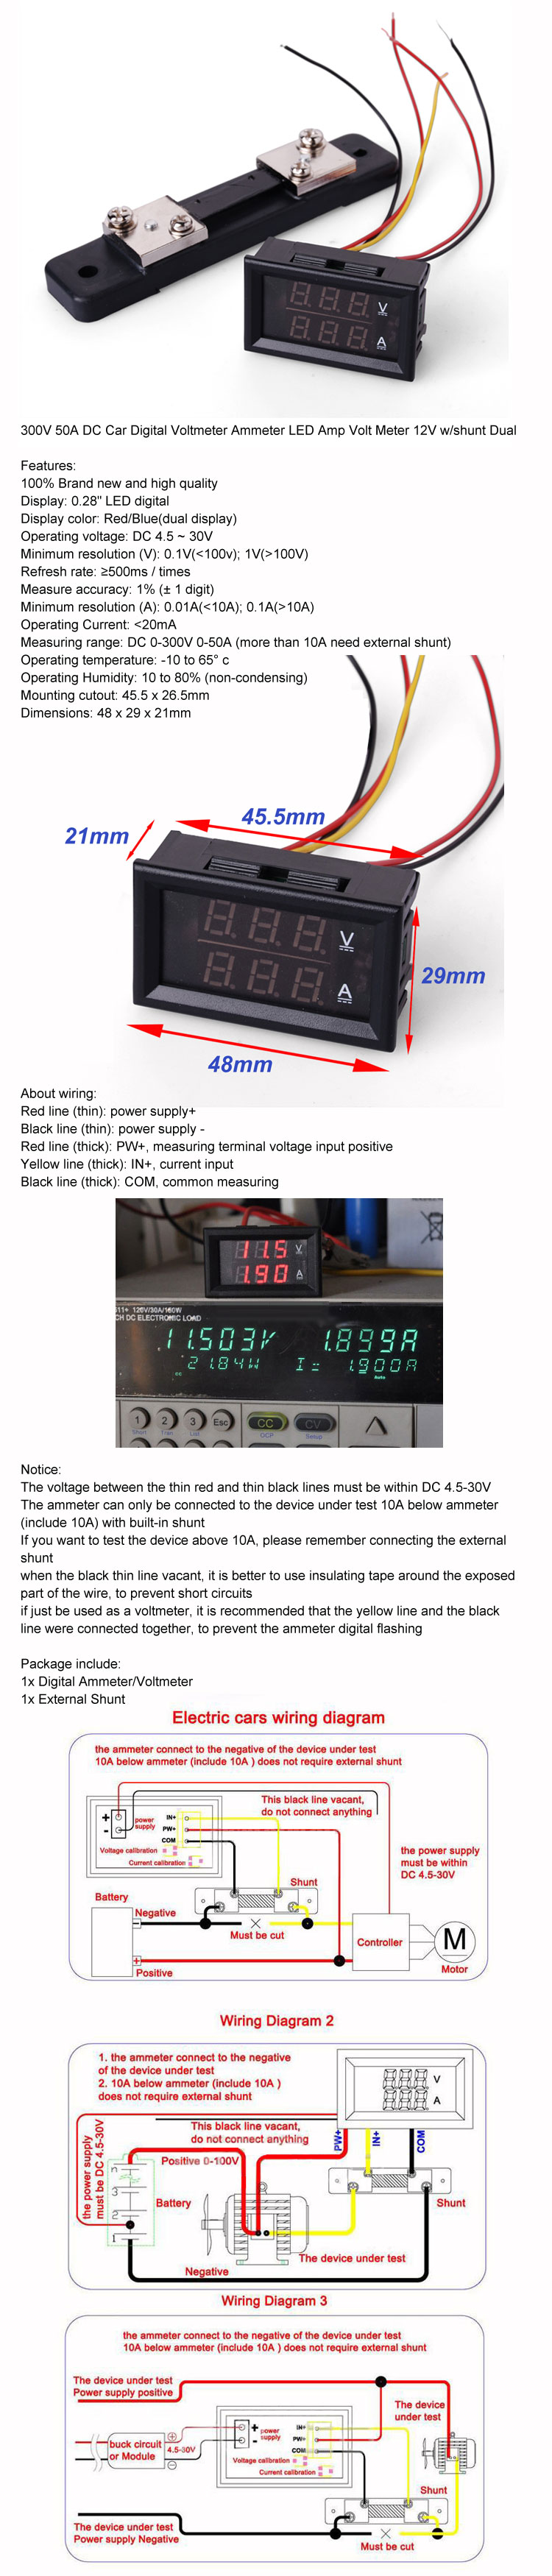 0 300v 50a Dc Digital Led Voltmeter Ammeter Amp Volt Tester Meter Wiring Diagram On For Aeproductgetsubject